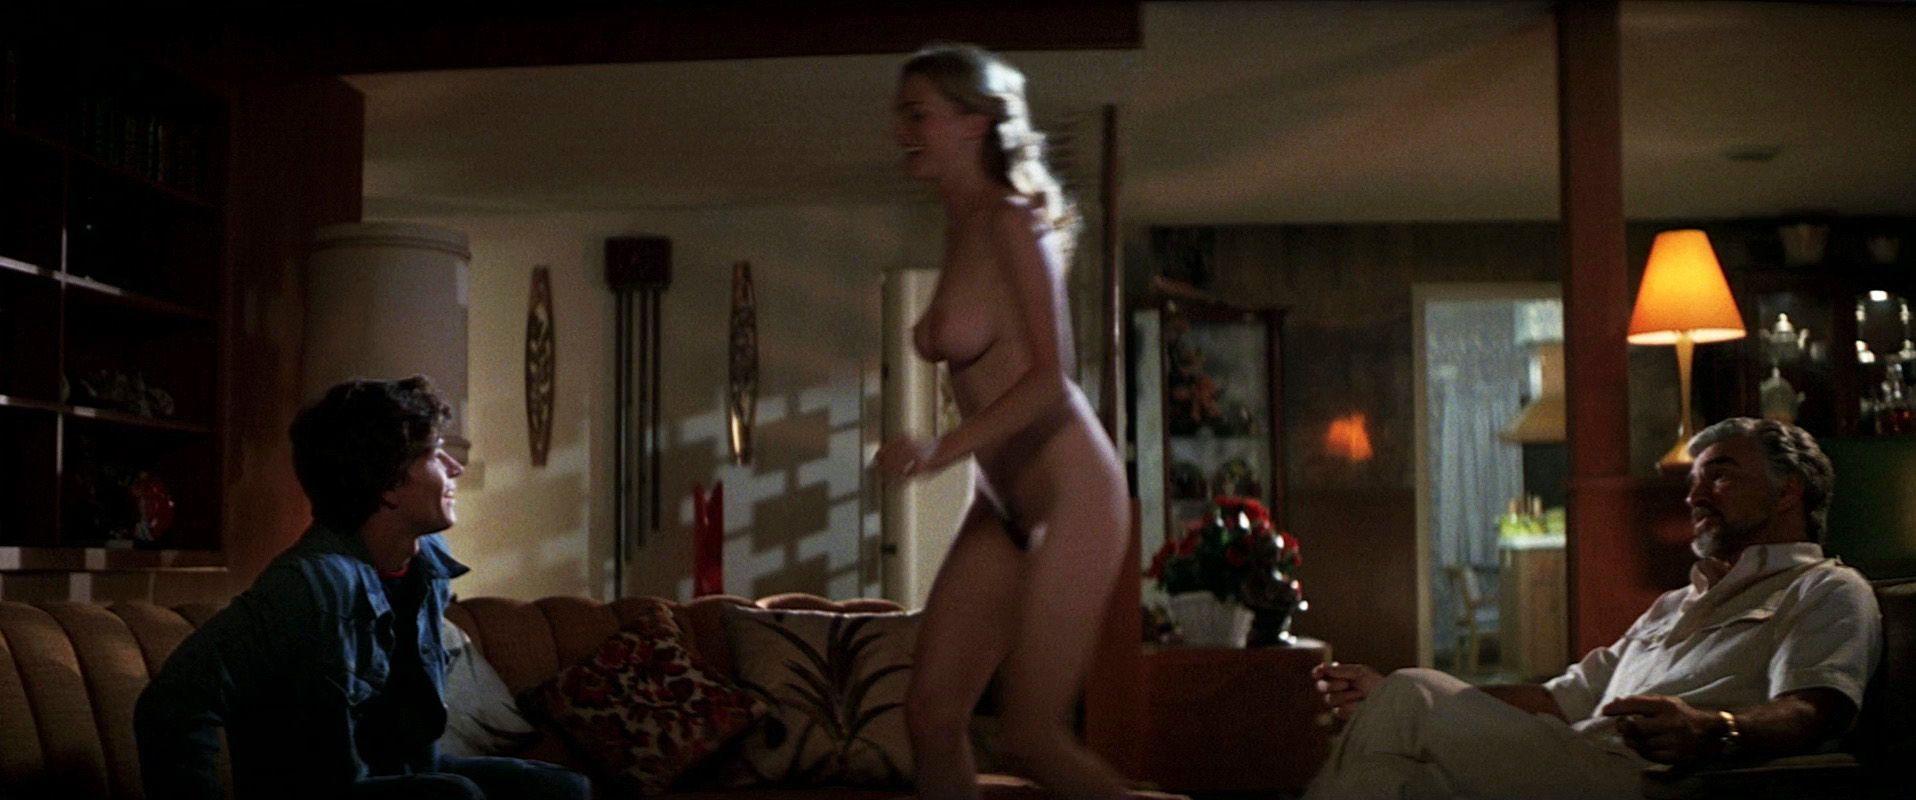 Clip Movie Actress Heather Graham Nude Selfie -9549